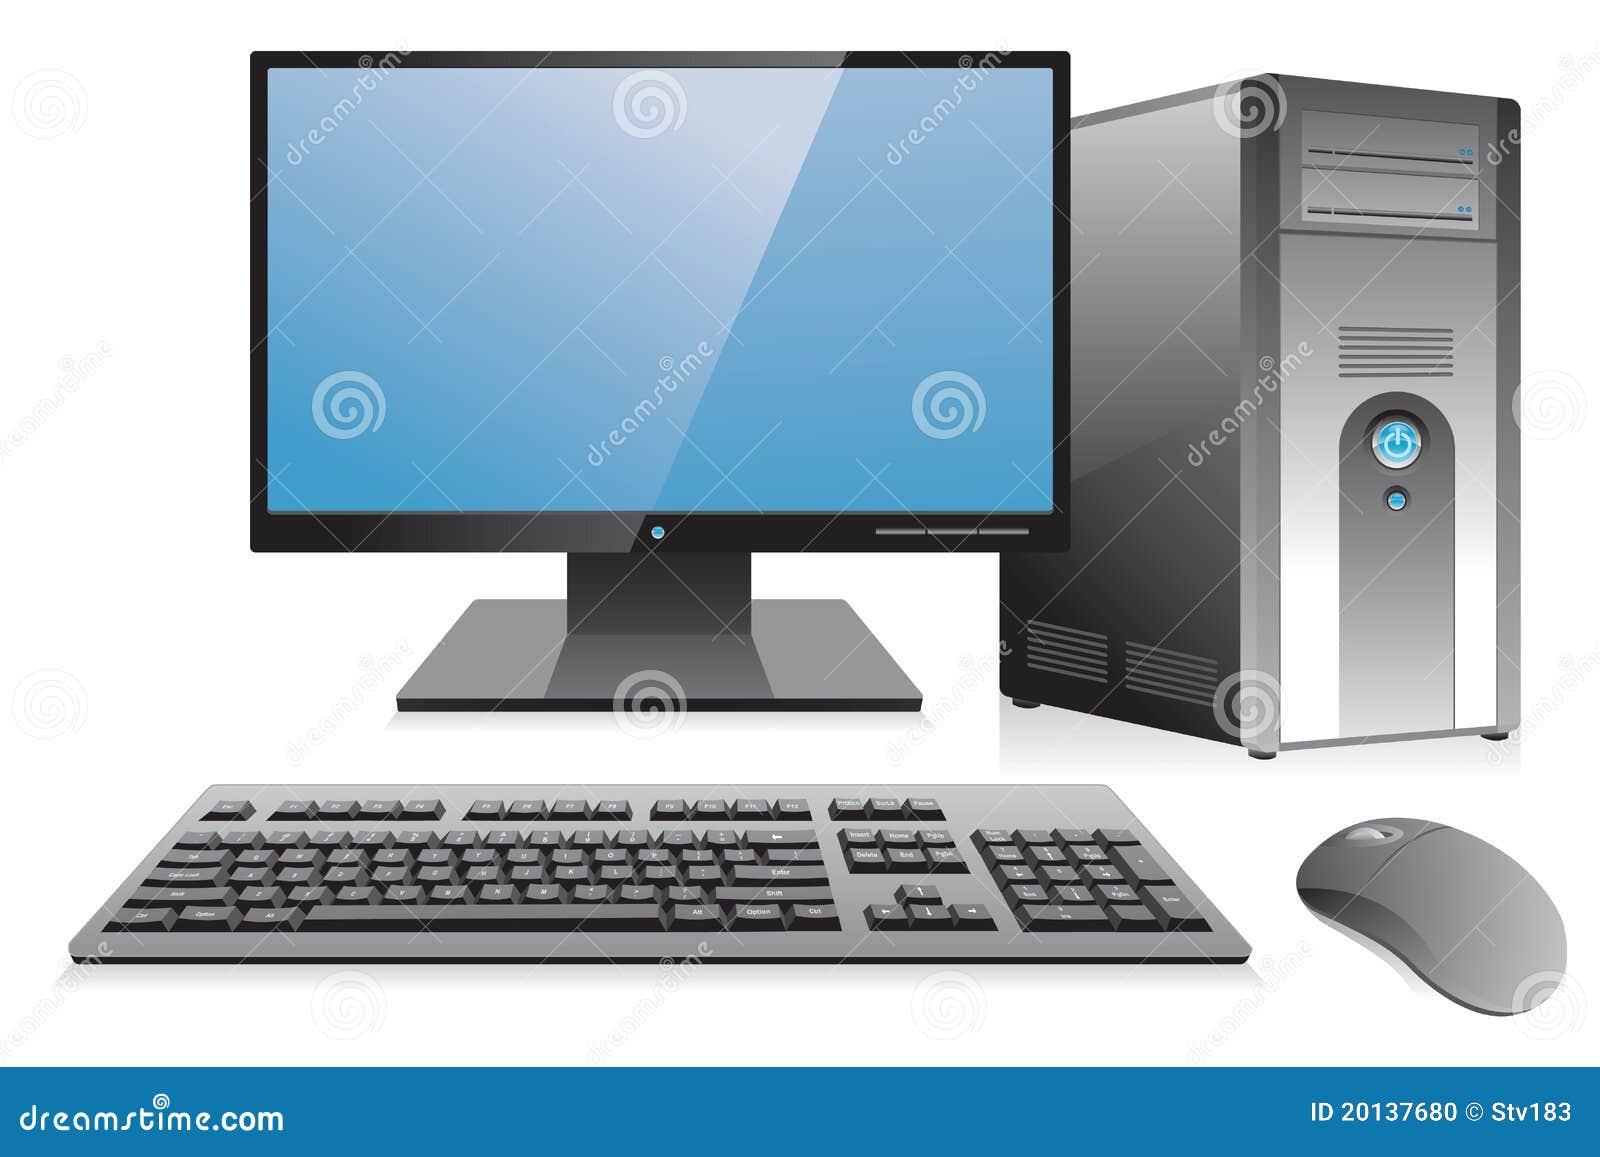 Desktop Computer Workstation Stock Photo Image 20137680